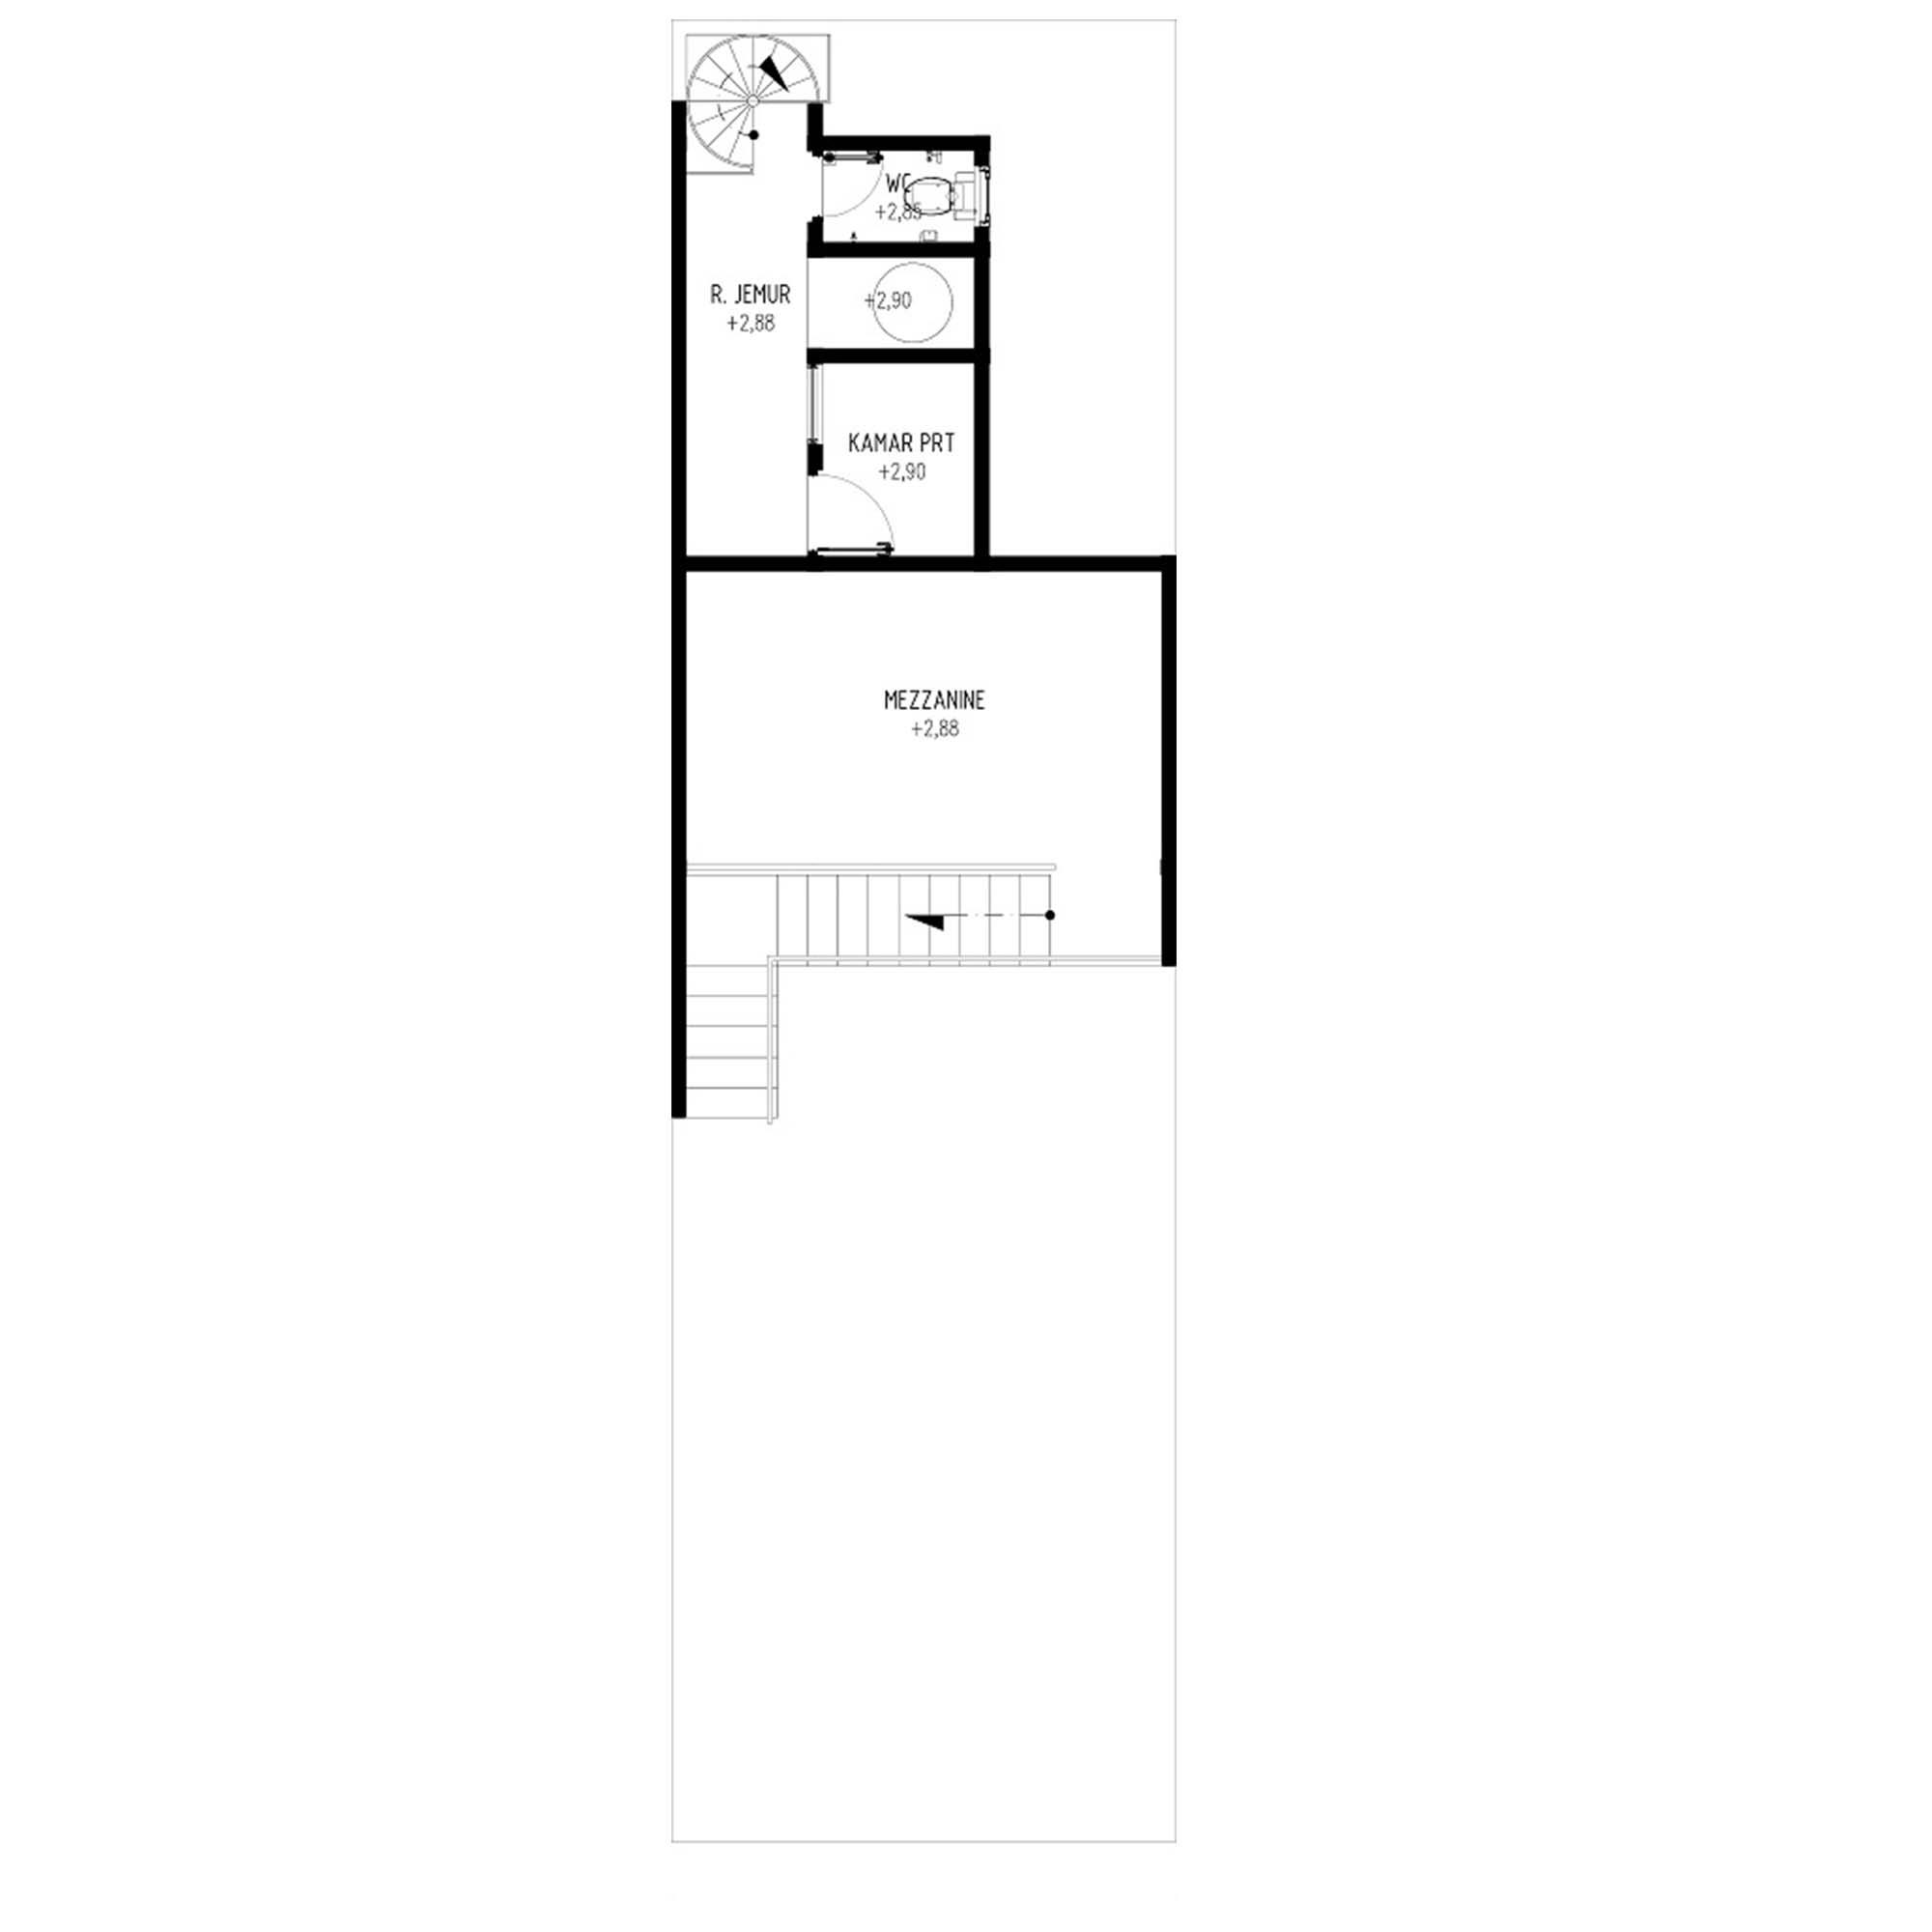 C2 HOUSE (3)